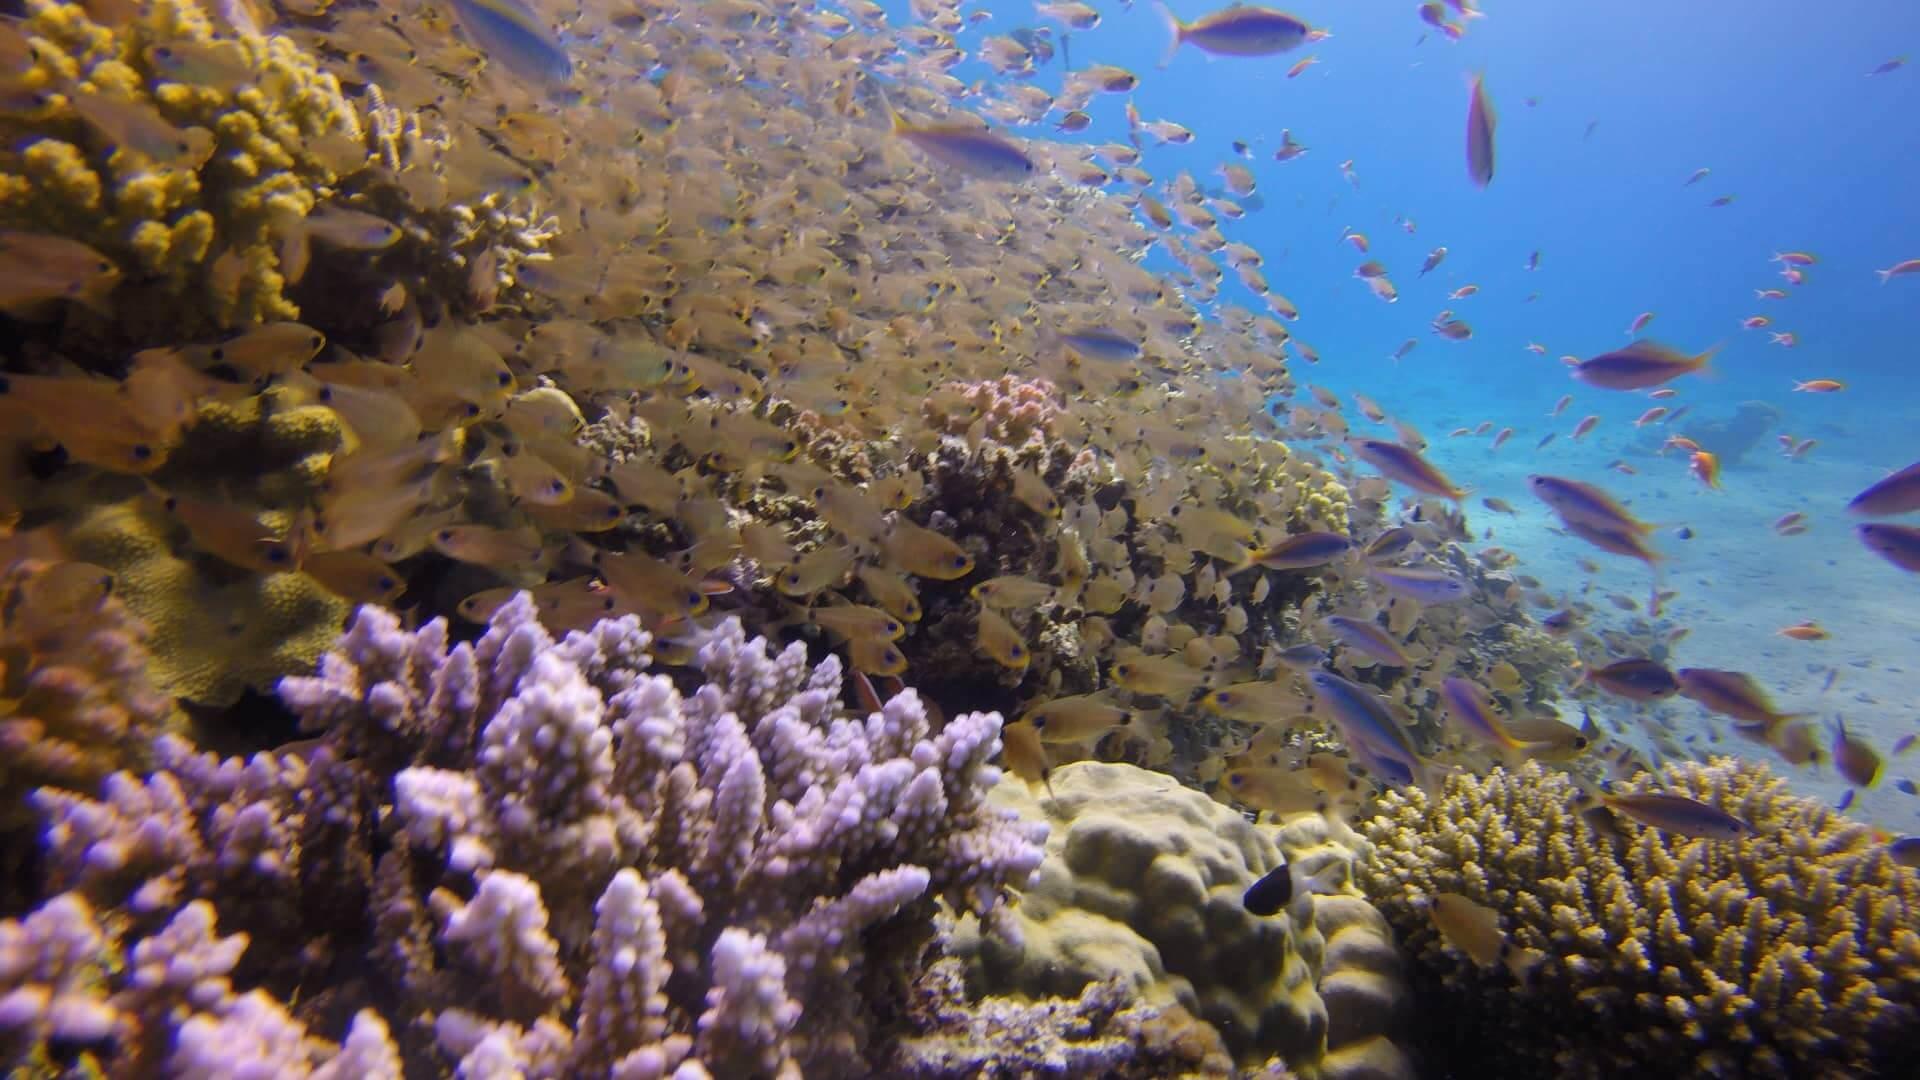 Egypt-REDSEA-Hurghada-DivePro-Academy-Scuba-Diving-Center-Coral-Reef